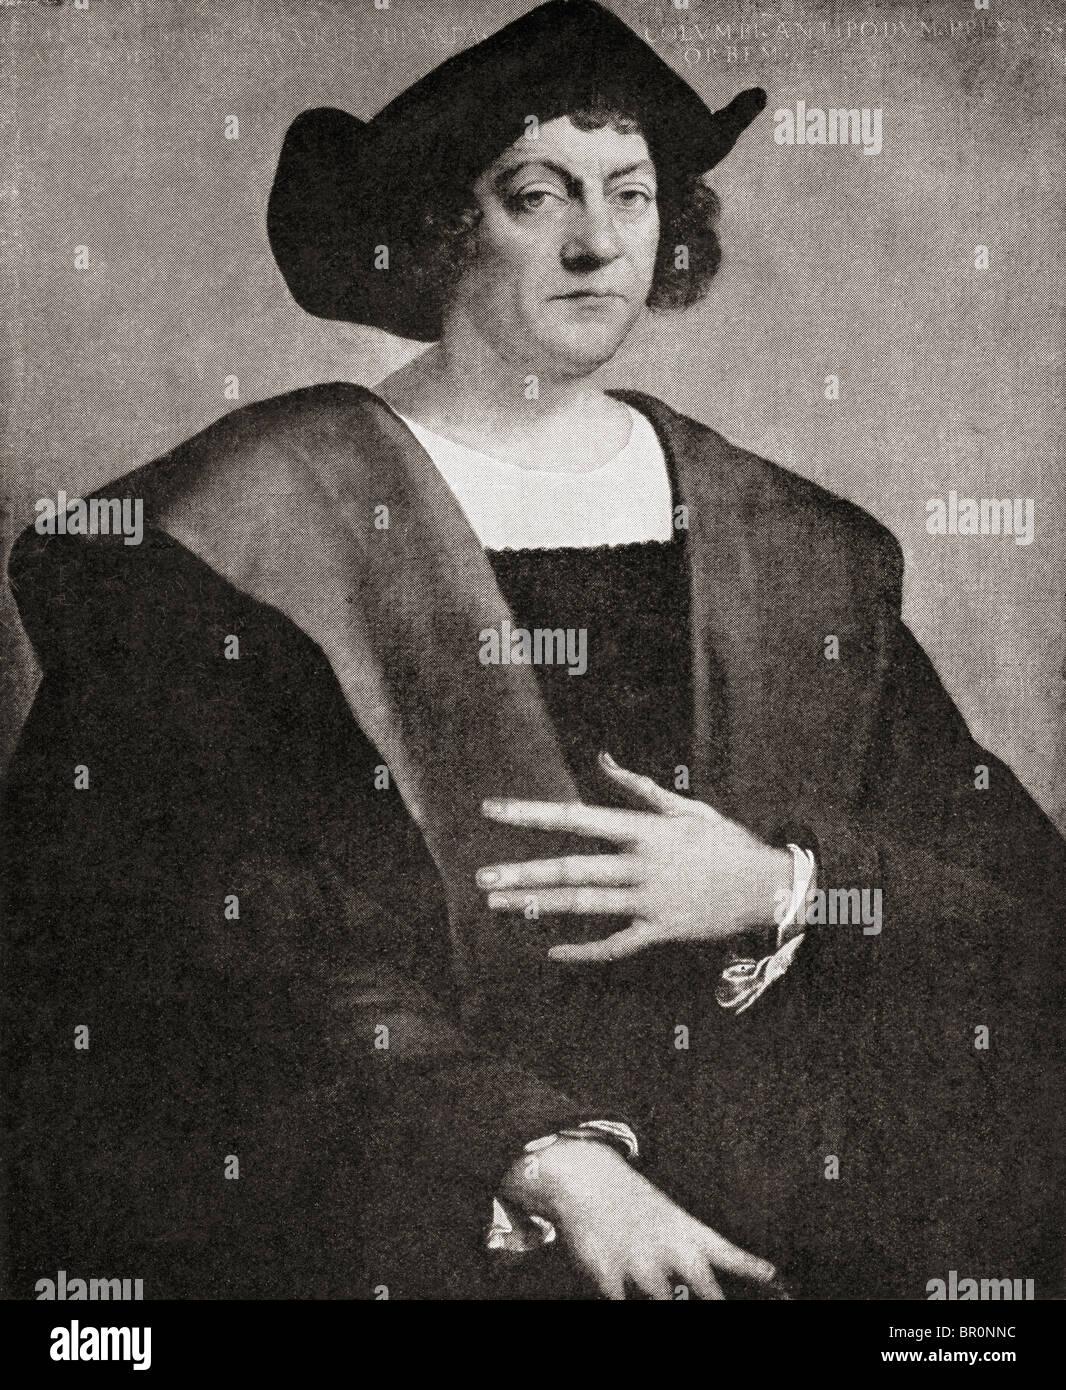 Christopher Columbus, c.1451 to 1506. Italian navigator, colonizer and explorer. - Stock Image